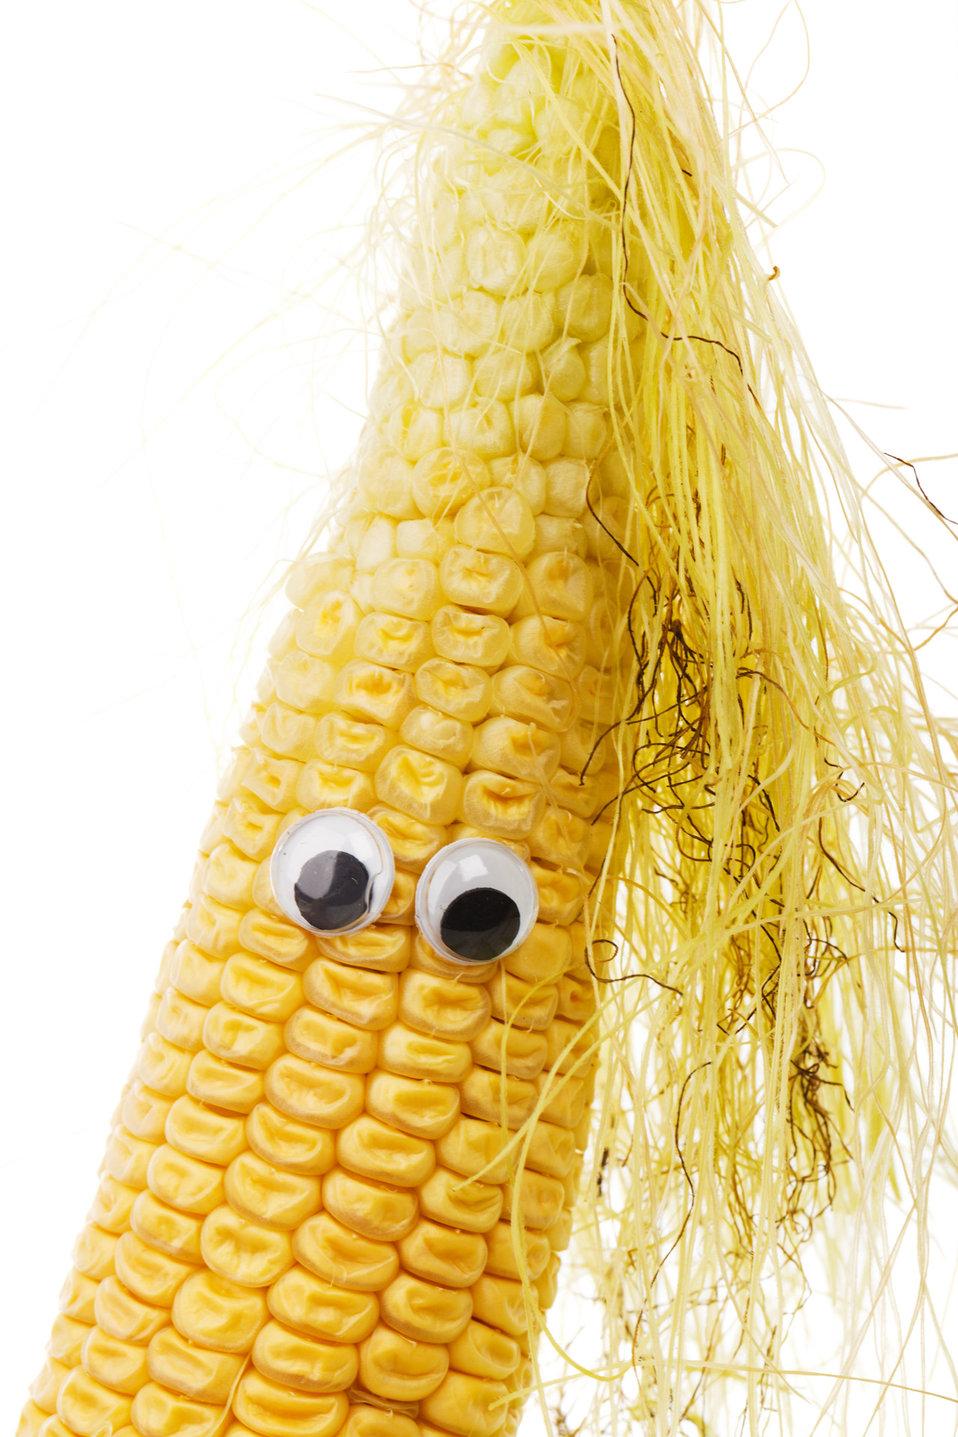 Funny corn face